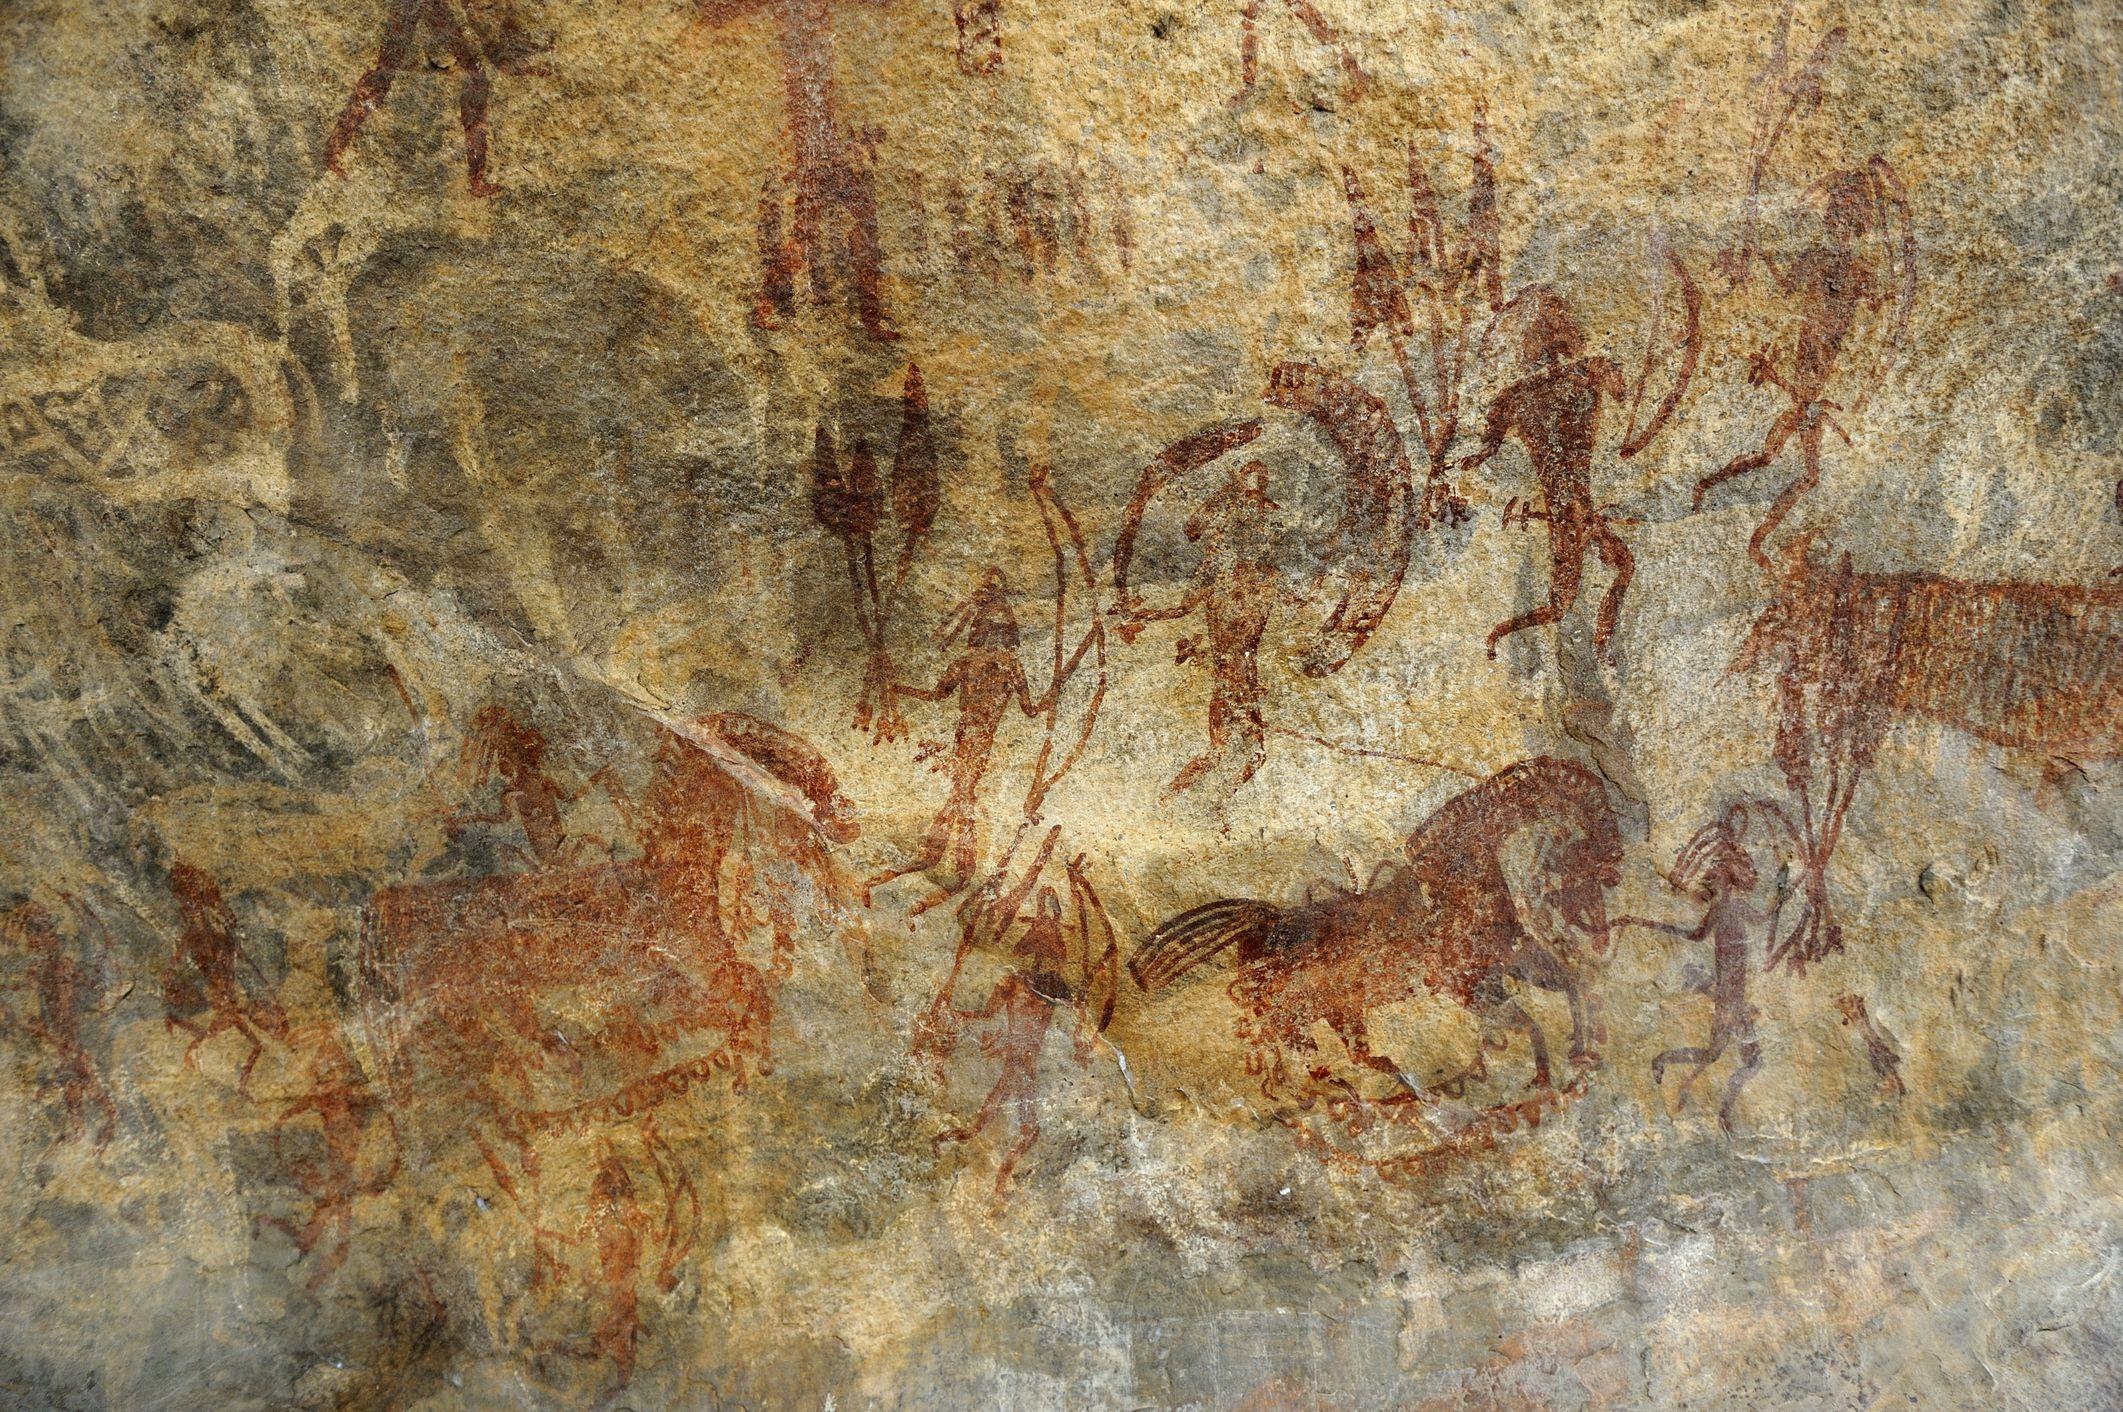 Bhimbetka Rock Painting